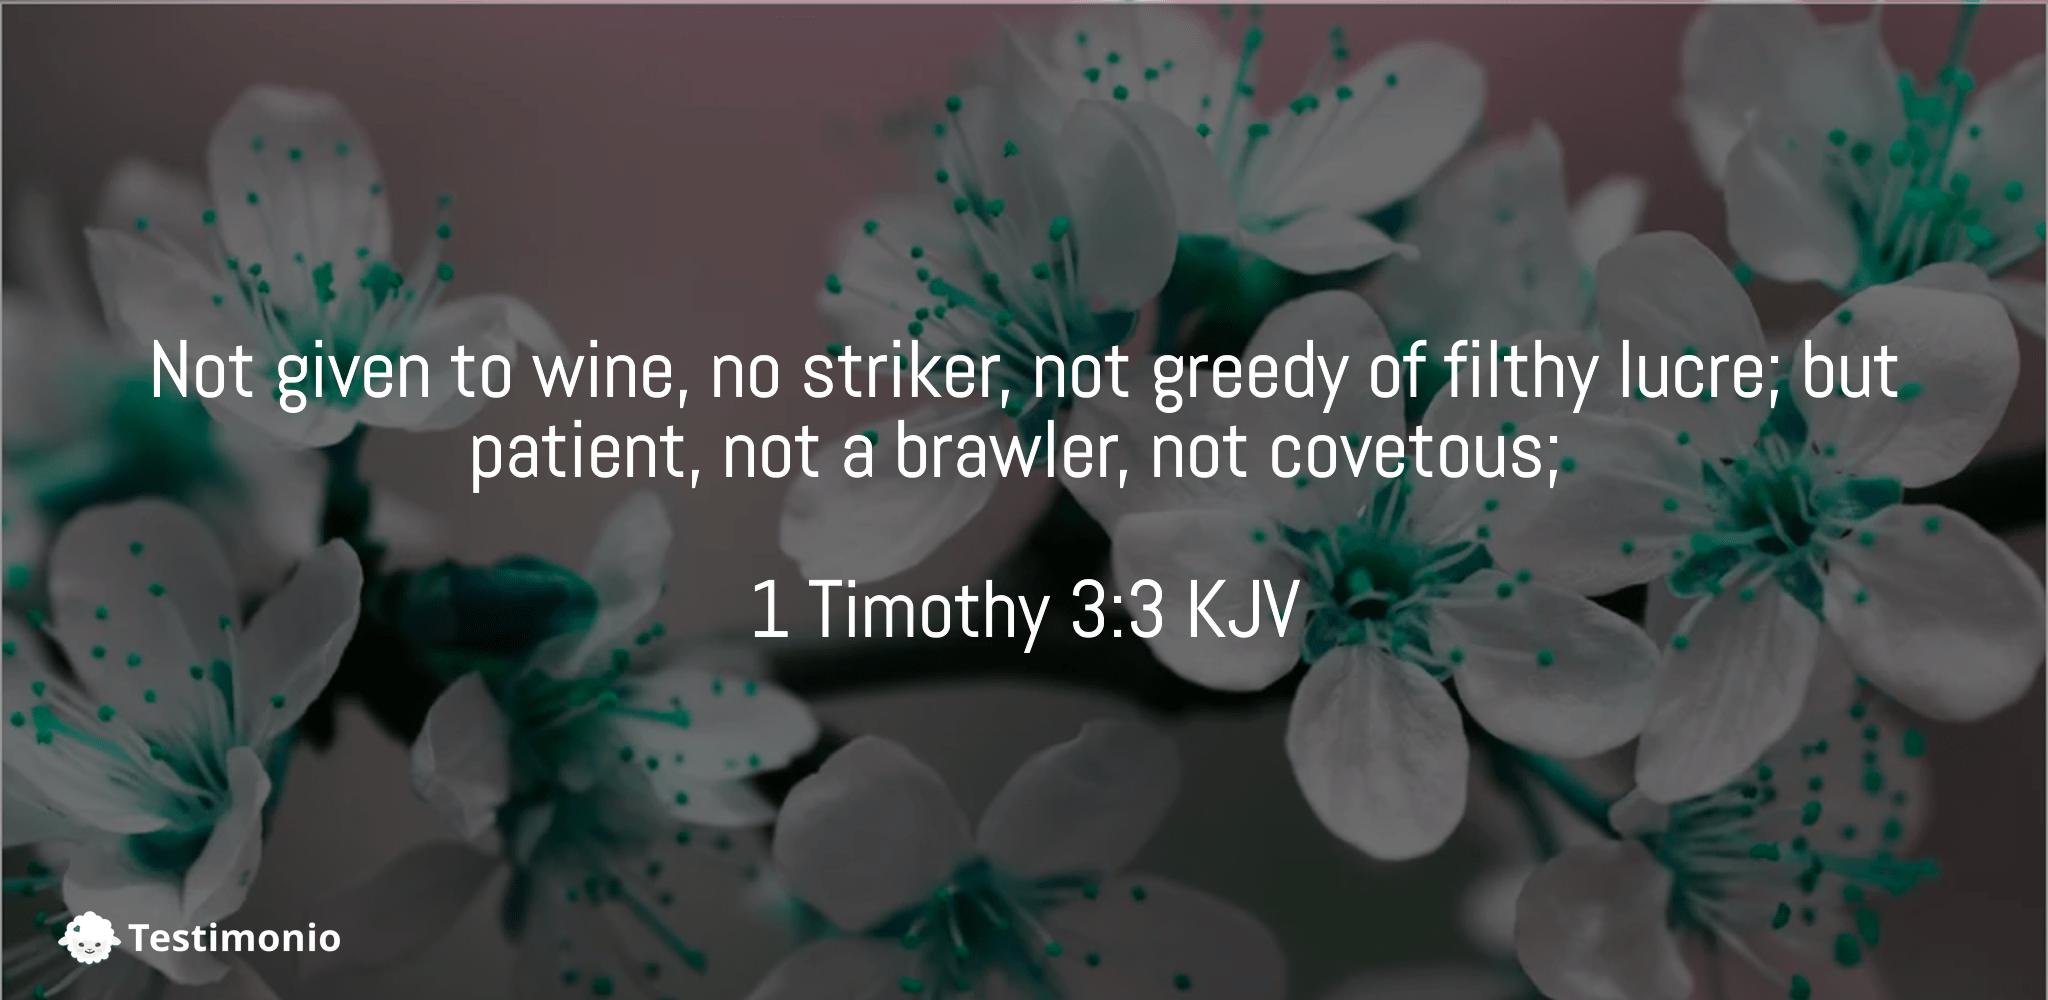 1 Timothy 3:3